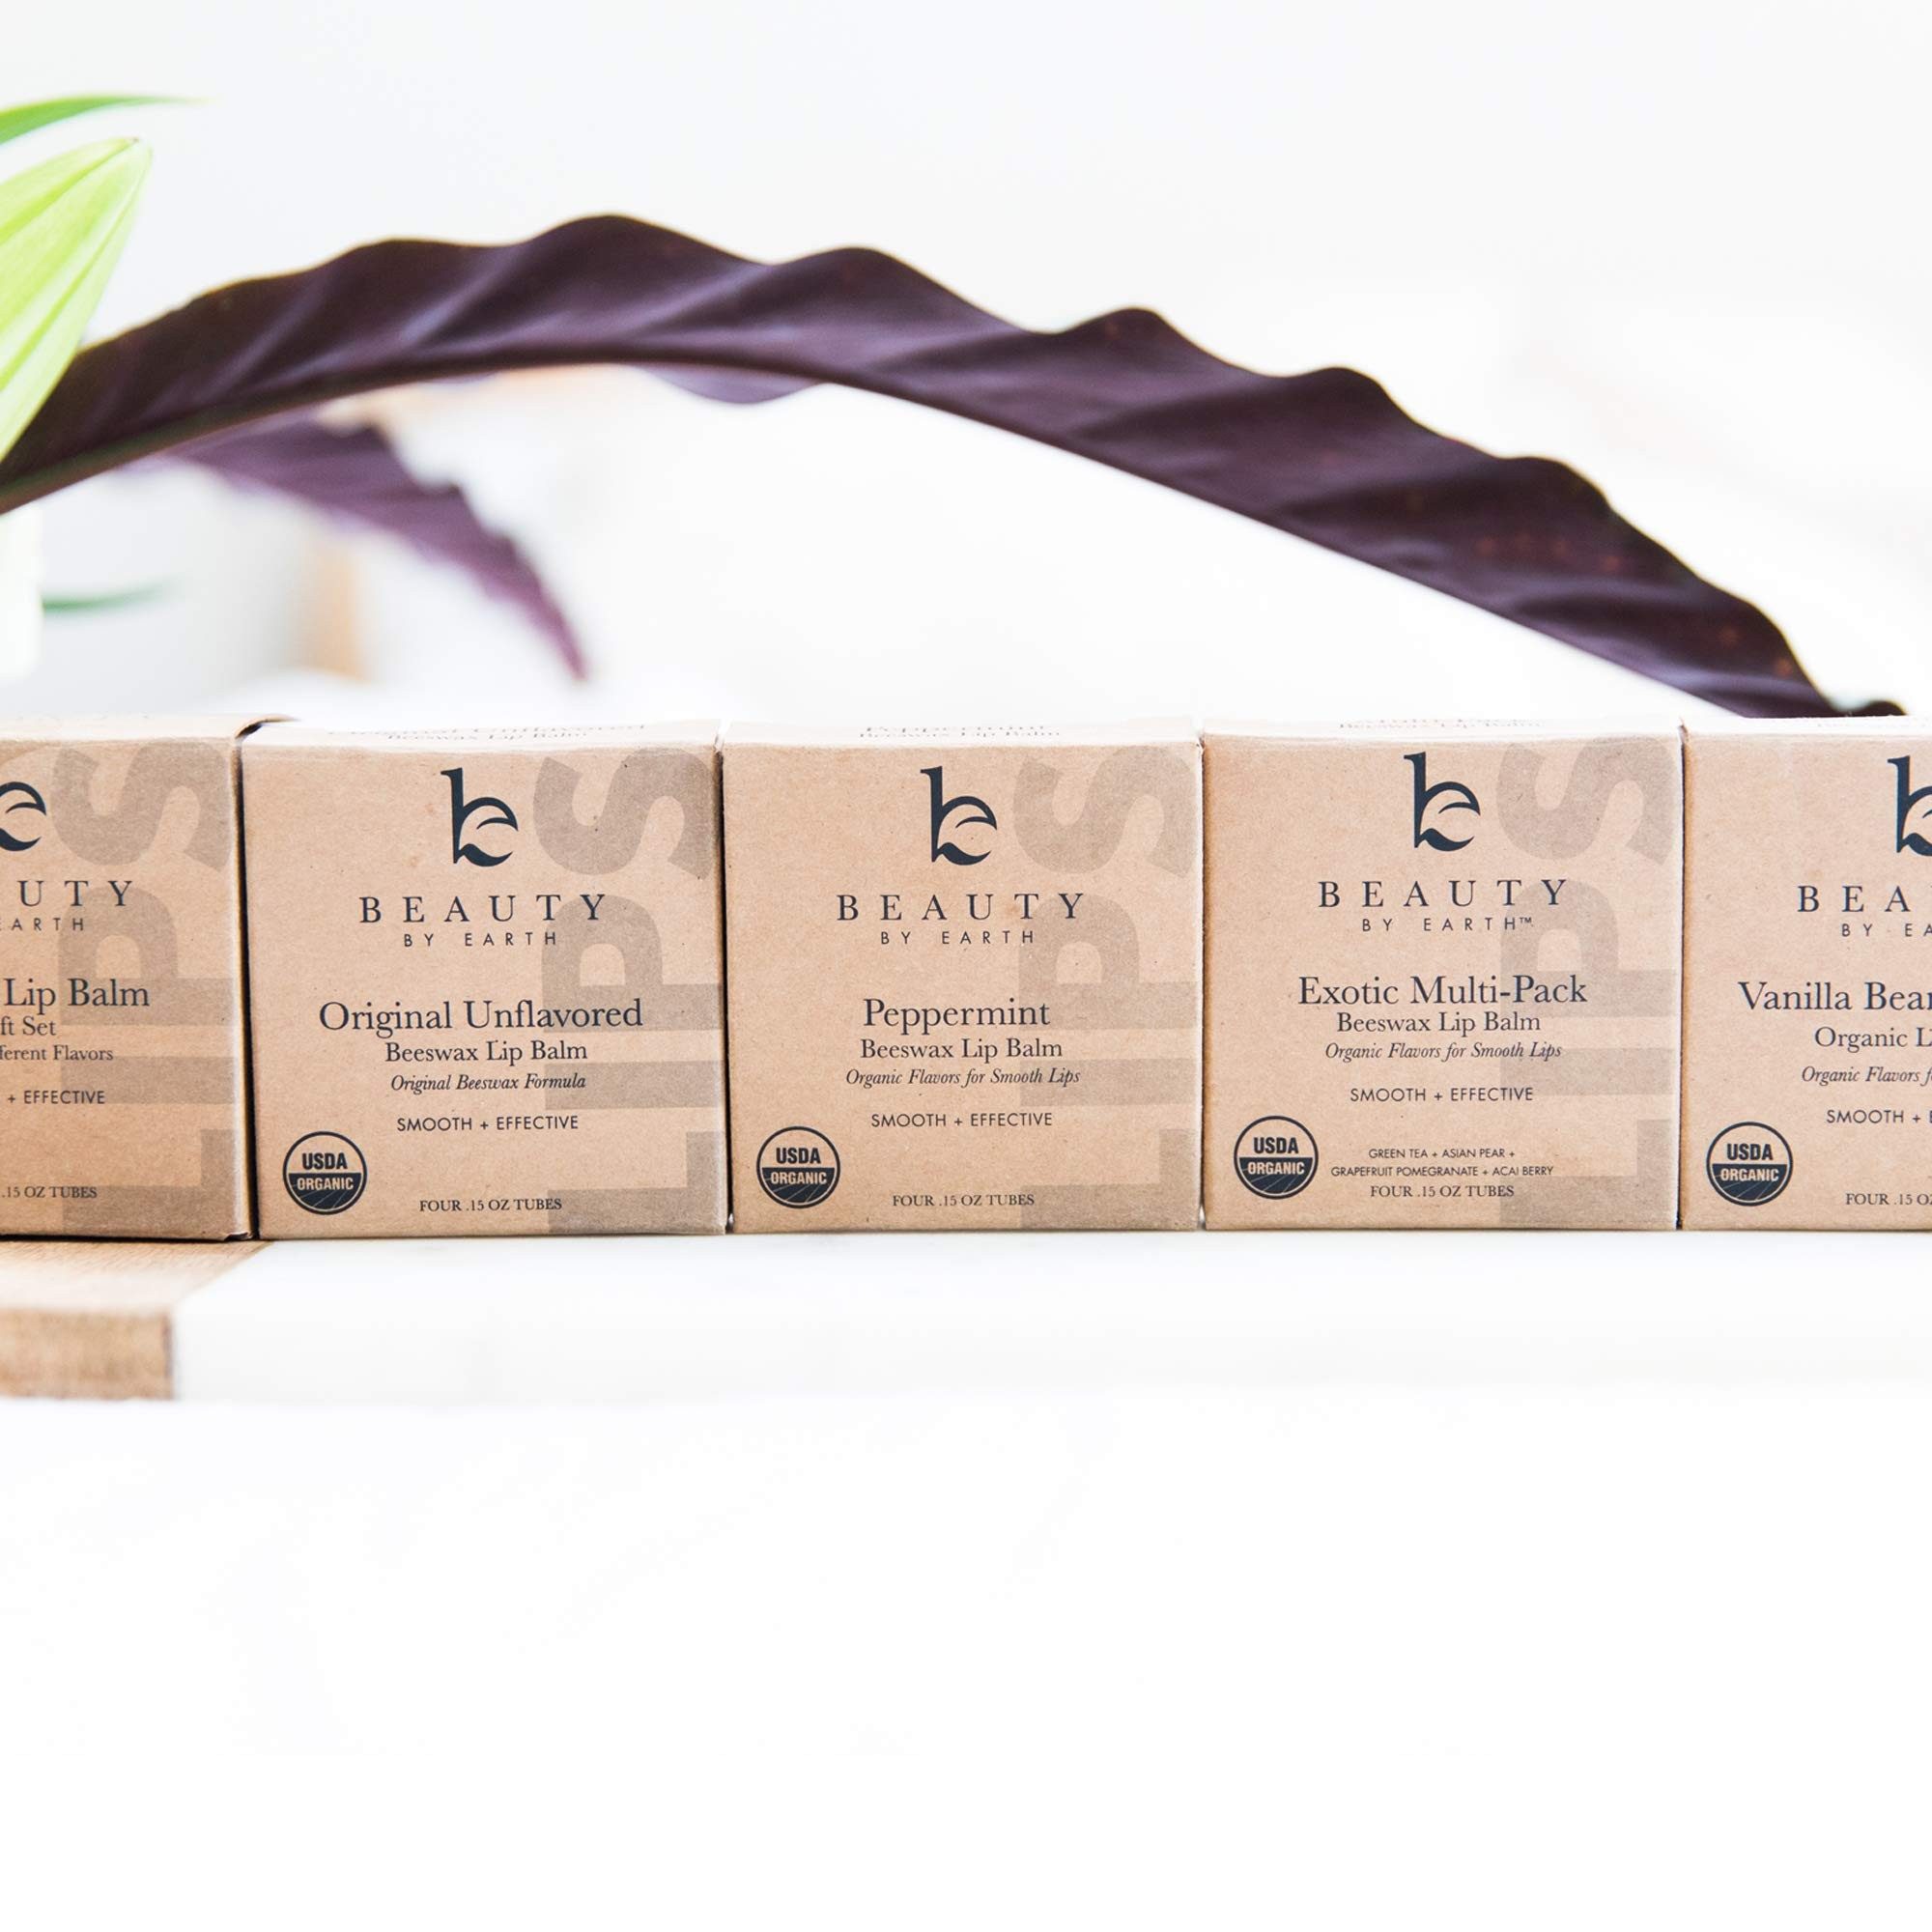 Organic Lip Balm Honey Vanilla - 4 Tubes of Natural Lip Balm, Lip Moisturizer, Lip Treatment for Dry Lips, Lip Care Gifts for Women or Men, Lip Repair, Organic Chapstick, Stocking Stuffer Ideas by Beauty by Earth